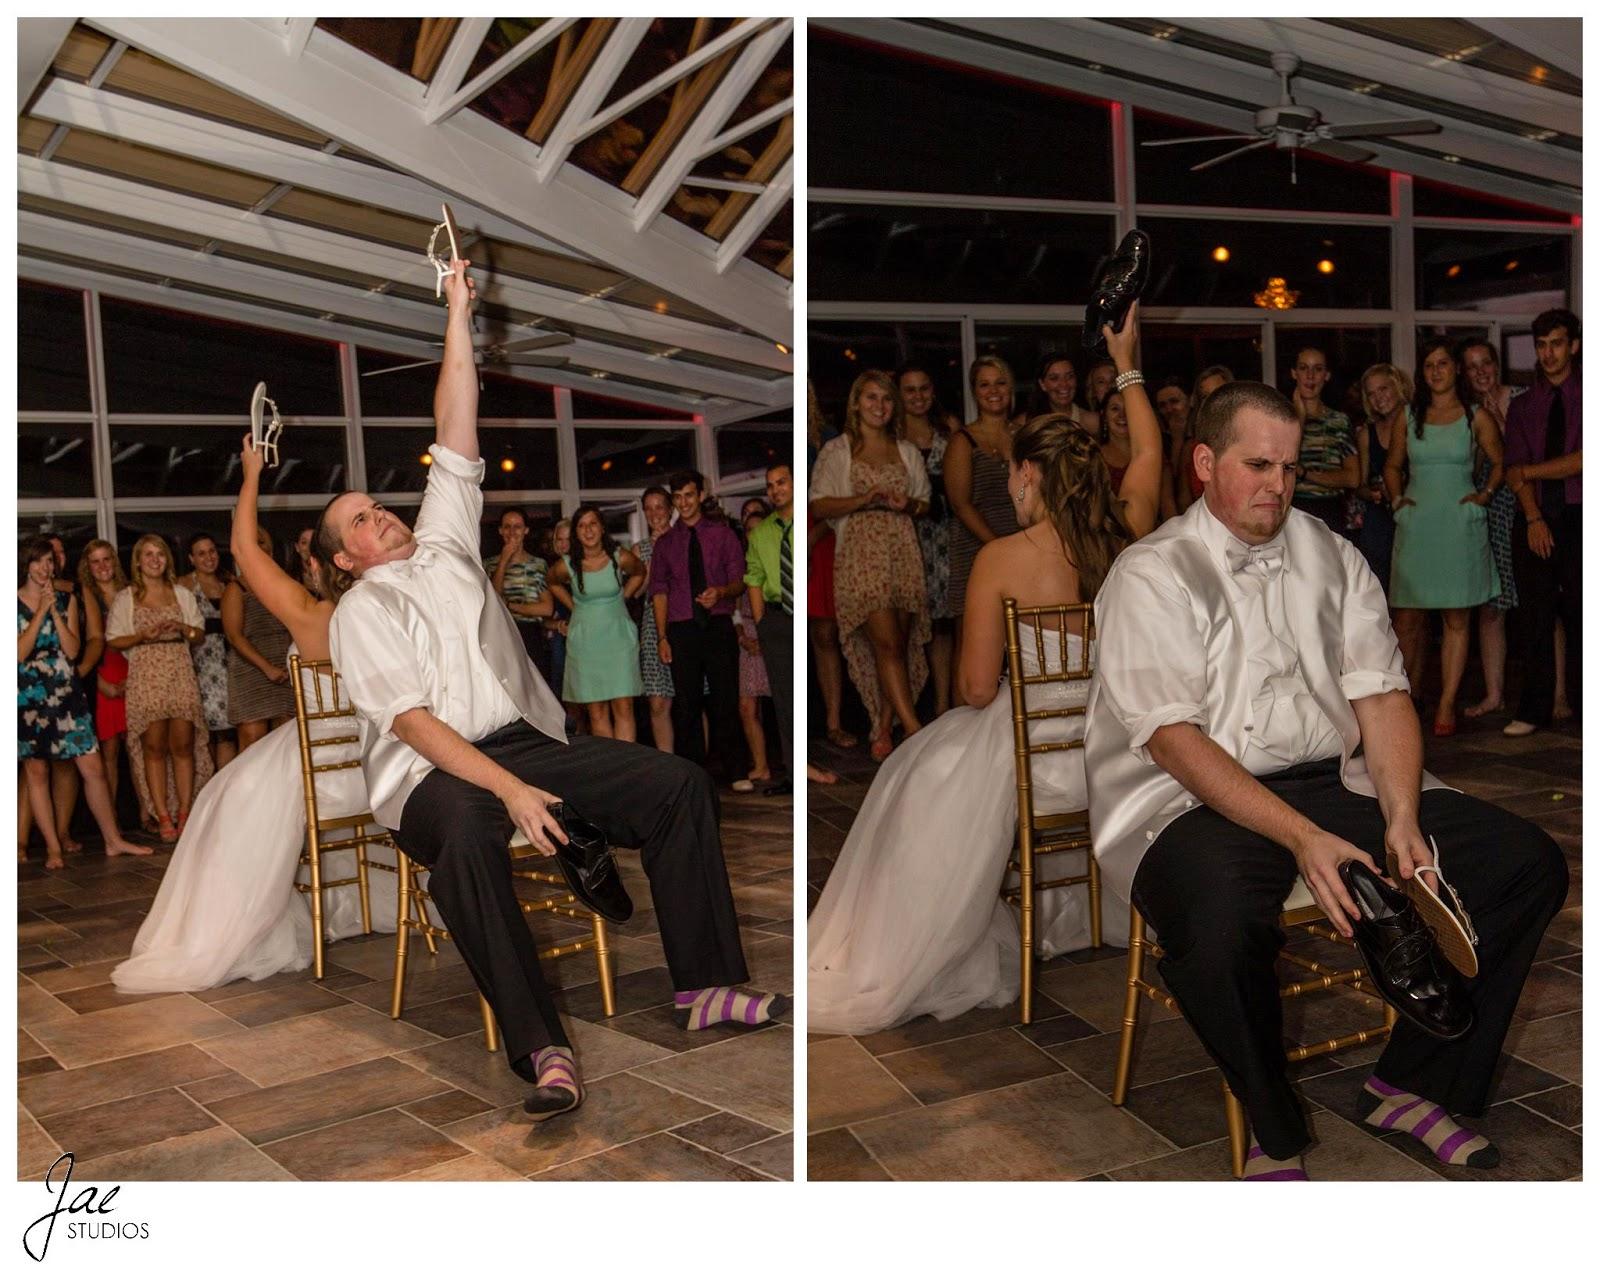 Jonathan and Julie, Bird cage, West Manor Estate, Wedding, Lynchburg, Virginia, Jae Studios, wedding, game, shoes, reception, bride, groom